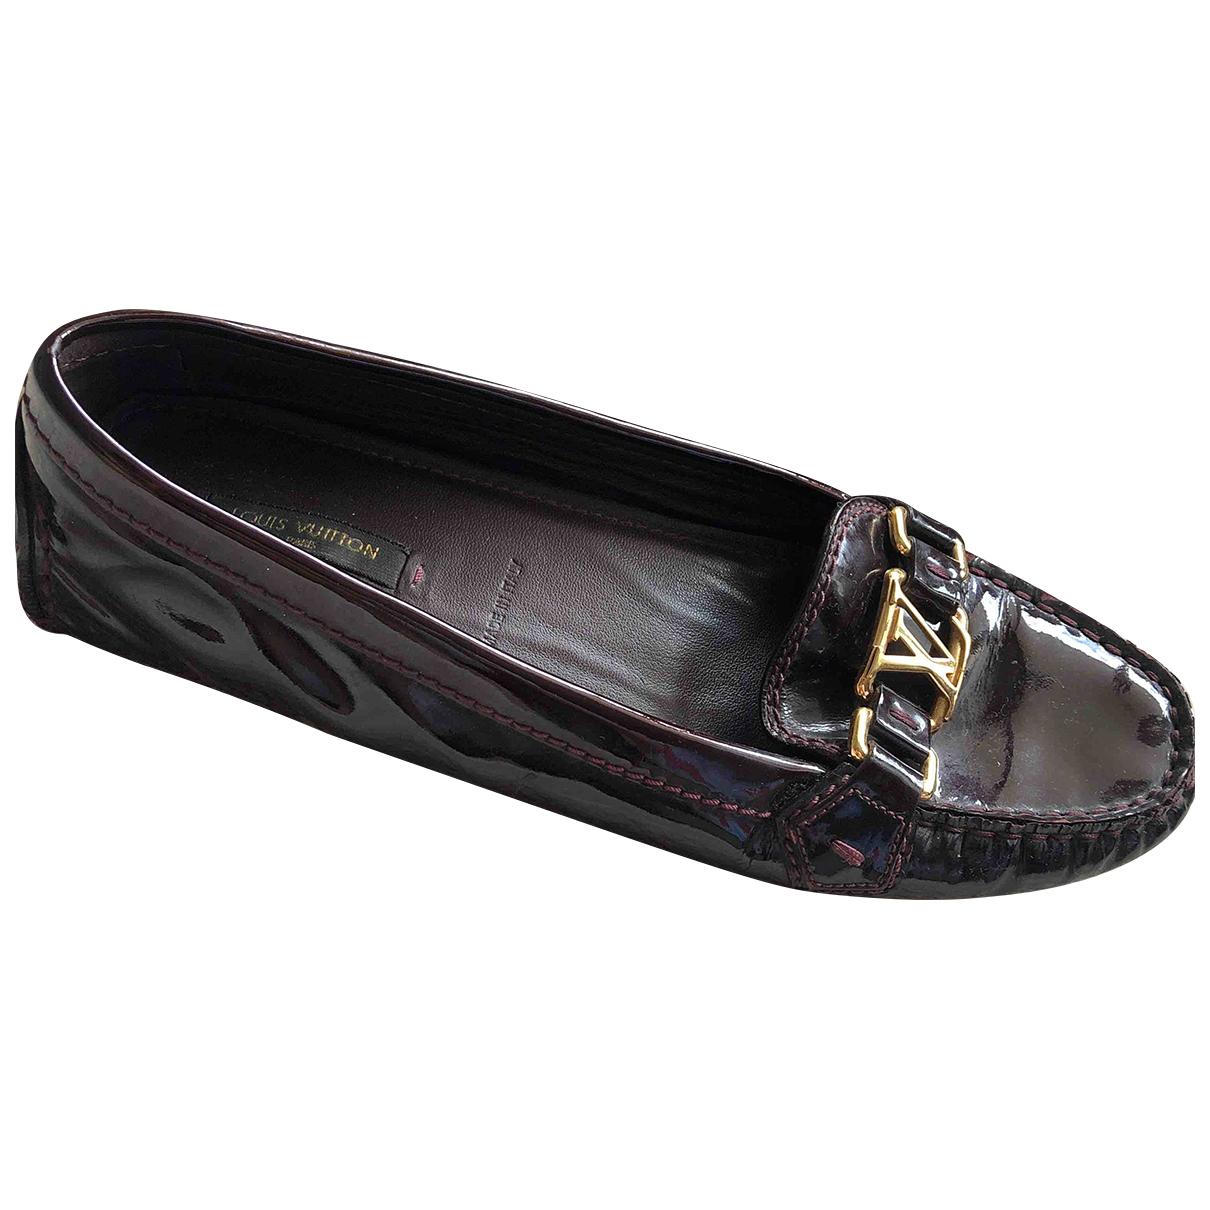 Louis Vuitton Upper Case Burgundy Patent leather Flats for Women 39 EU